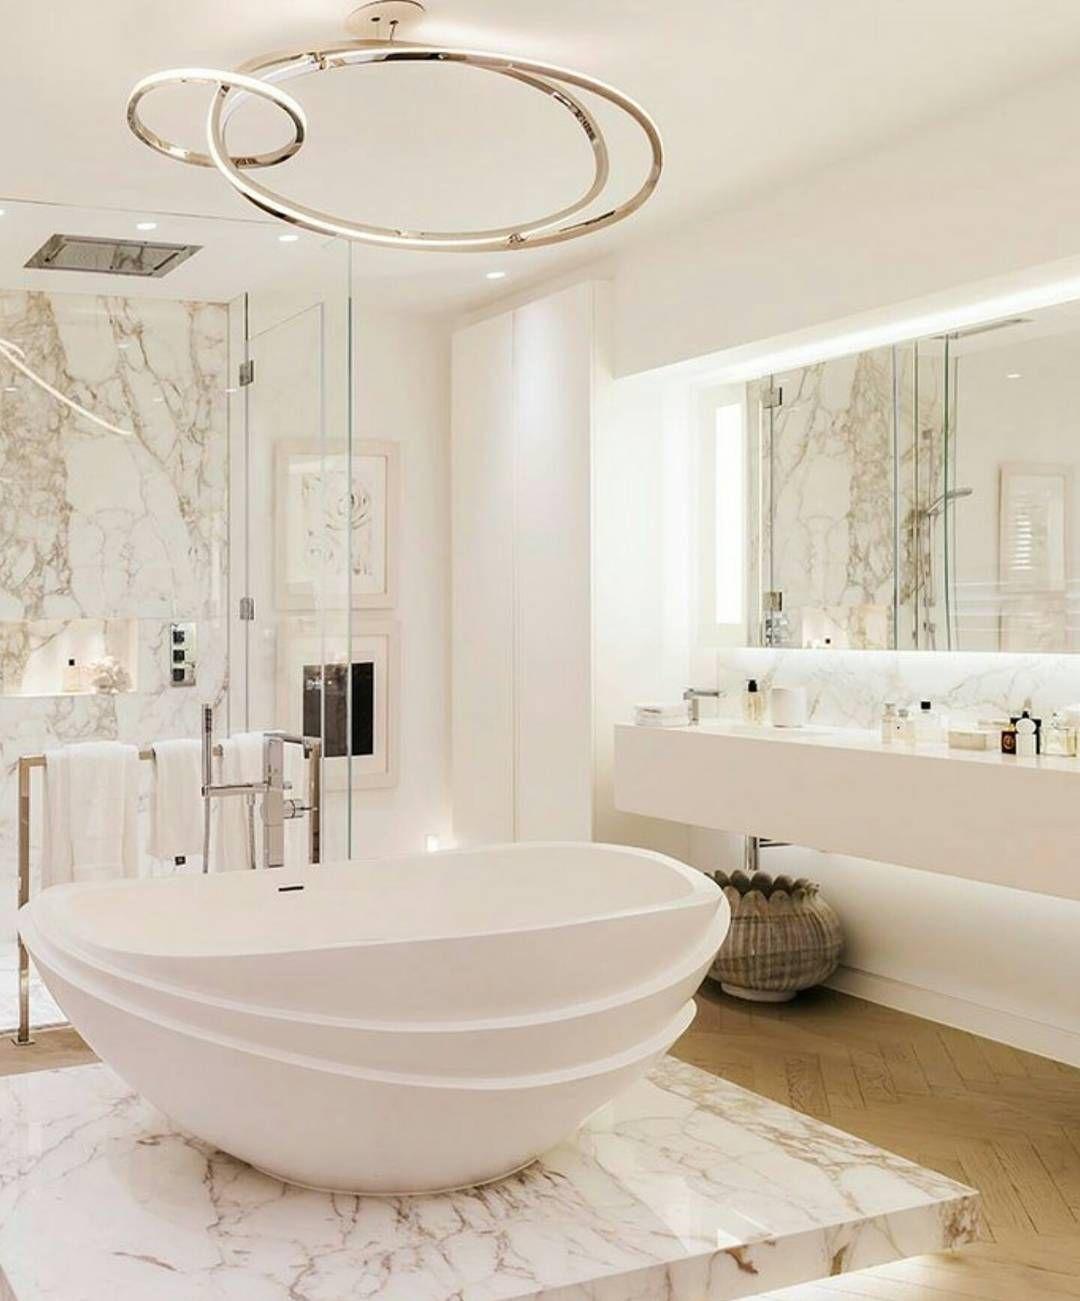 Pin by Ruba Maa Albared on Bath | Pinterest | Chandeliers modern ...